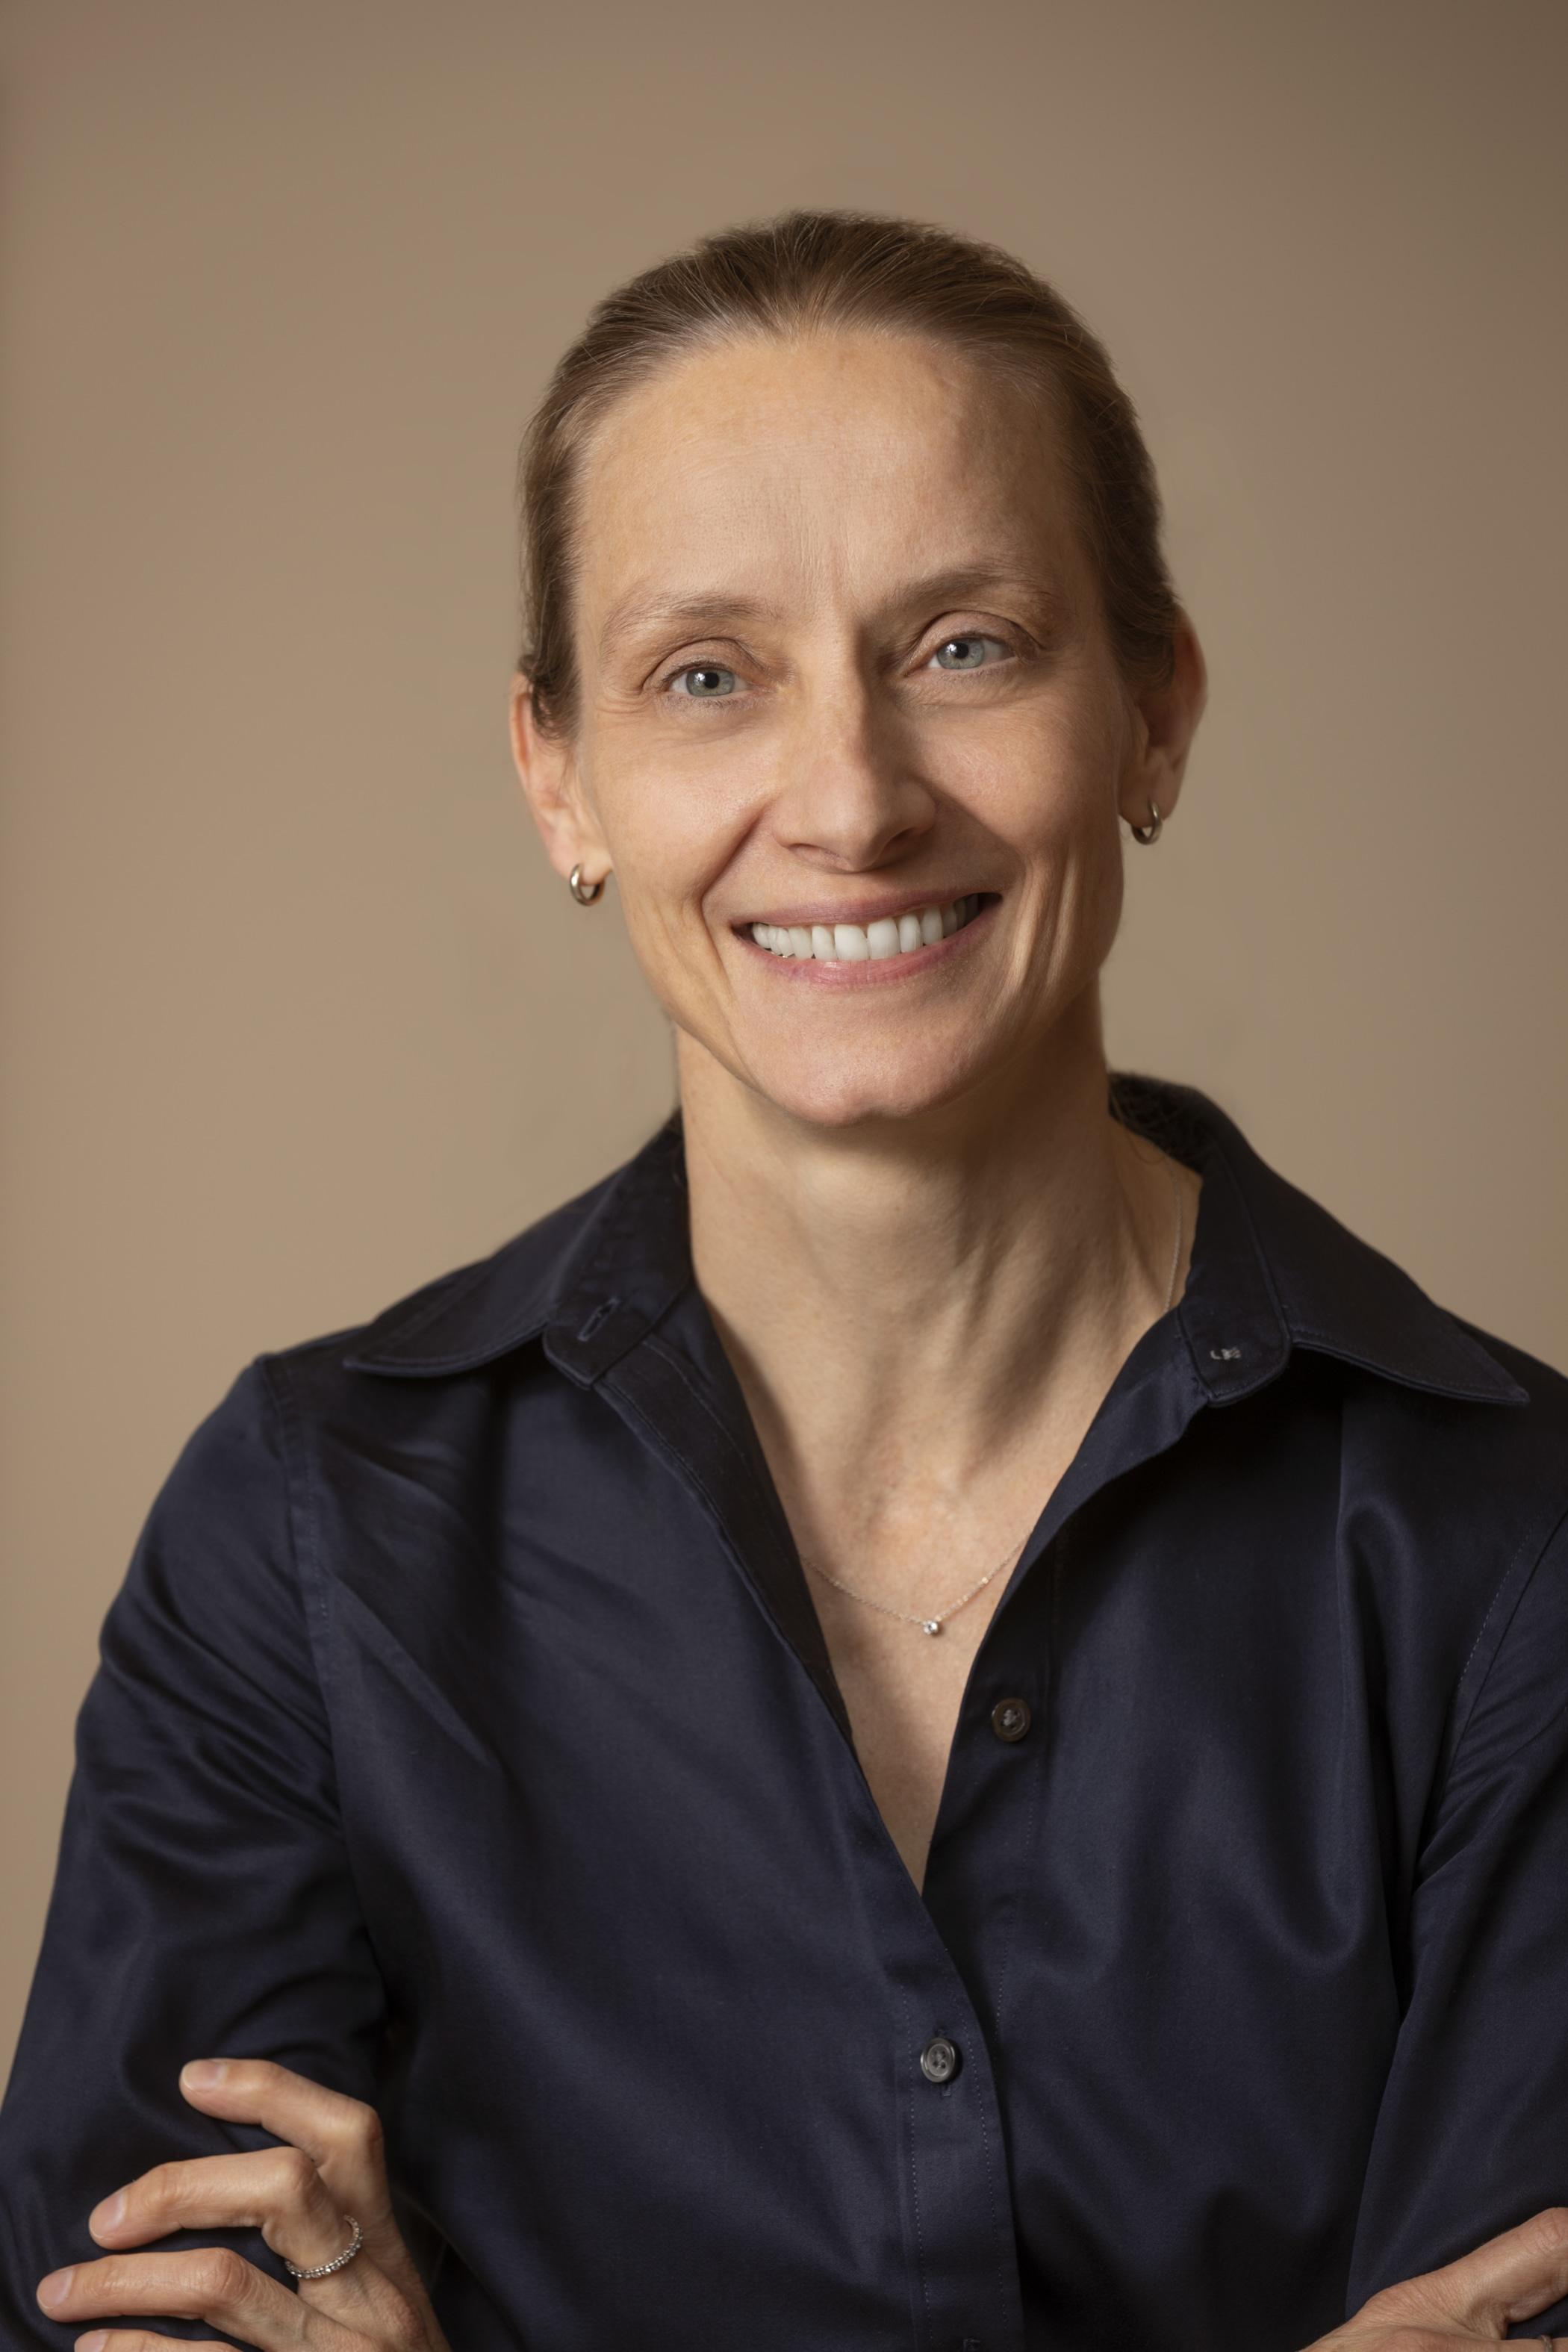 Dr. Stephanie Halene